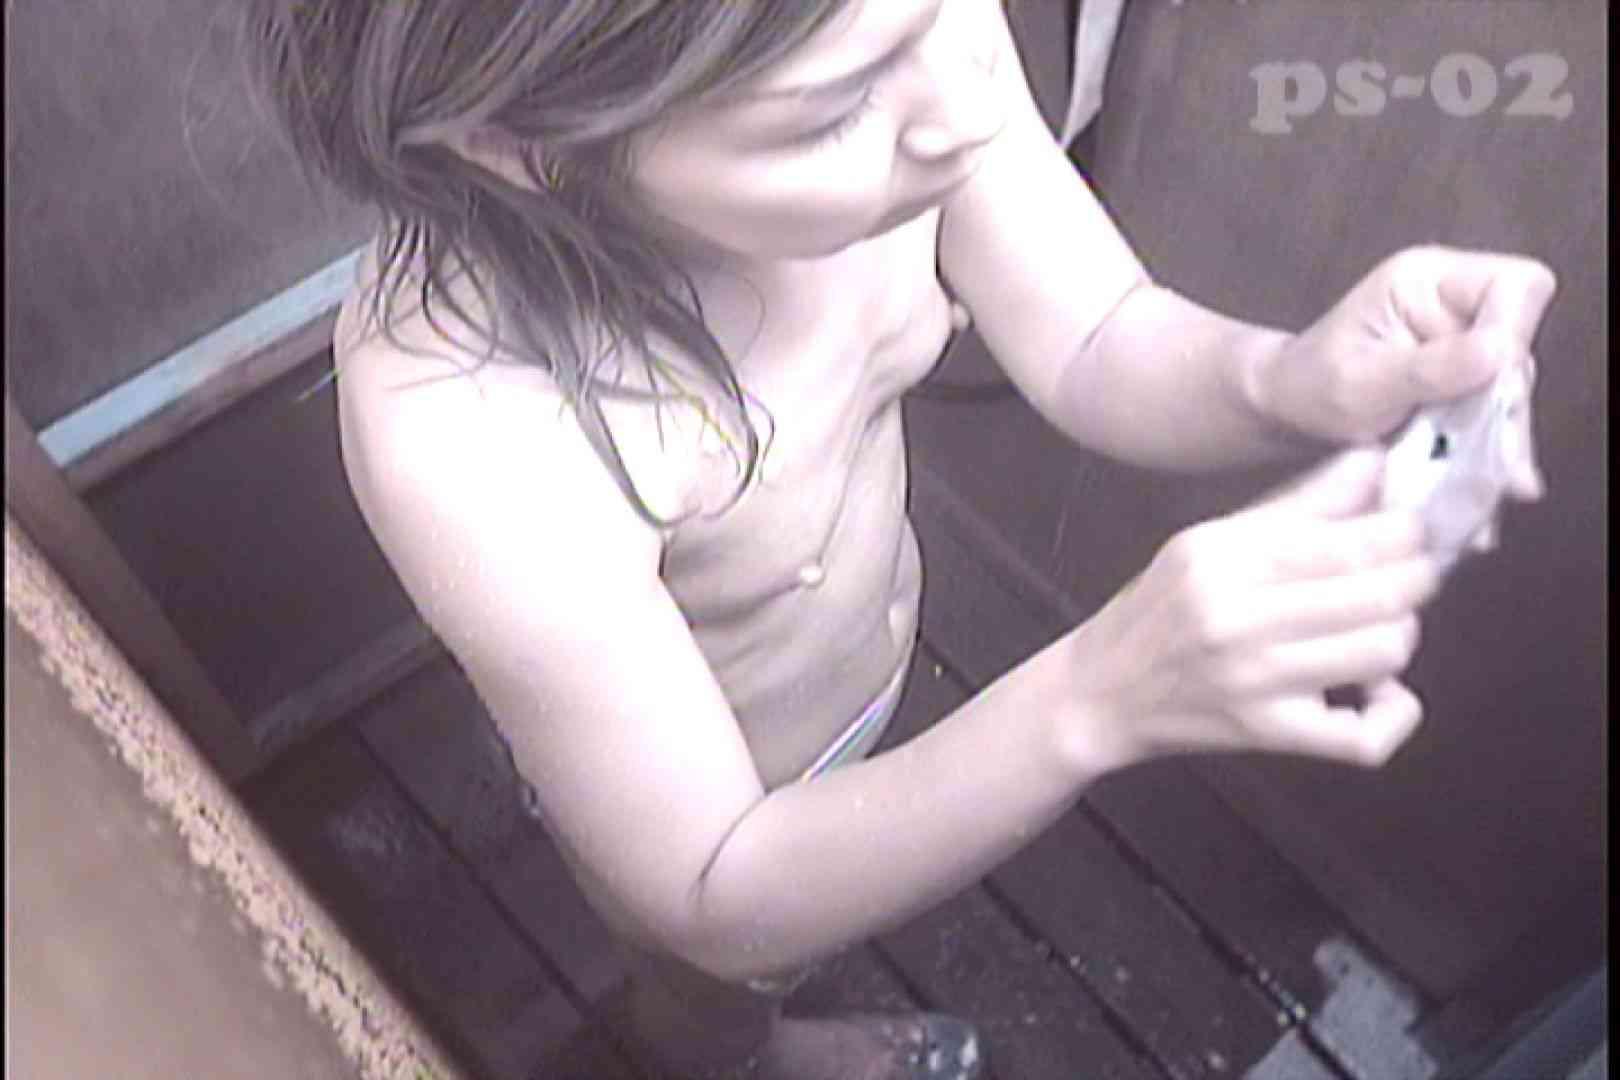 File.09 貧乳そして大きな乳首のお女市さん 盗撮  102PIX 40